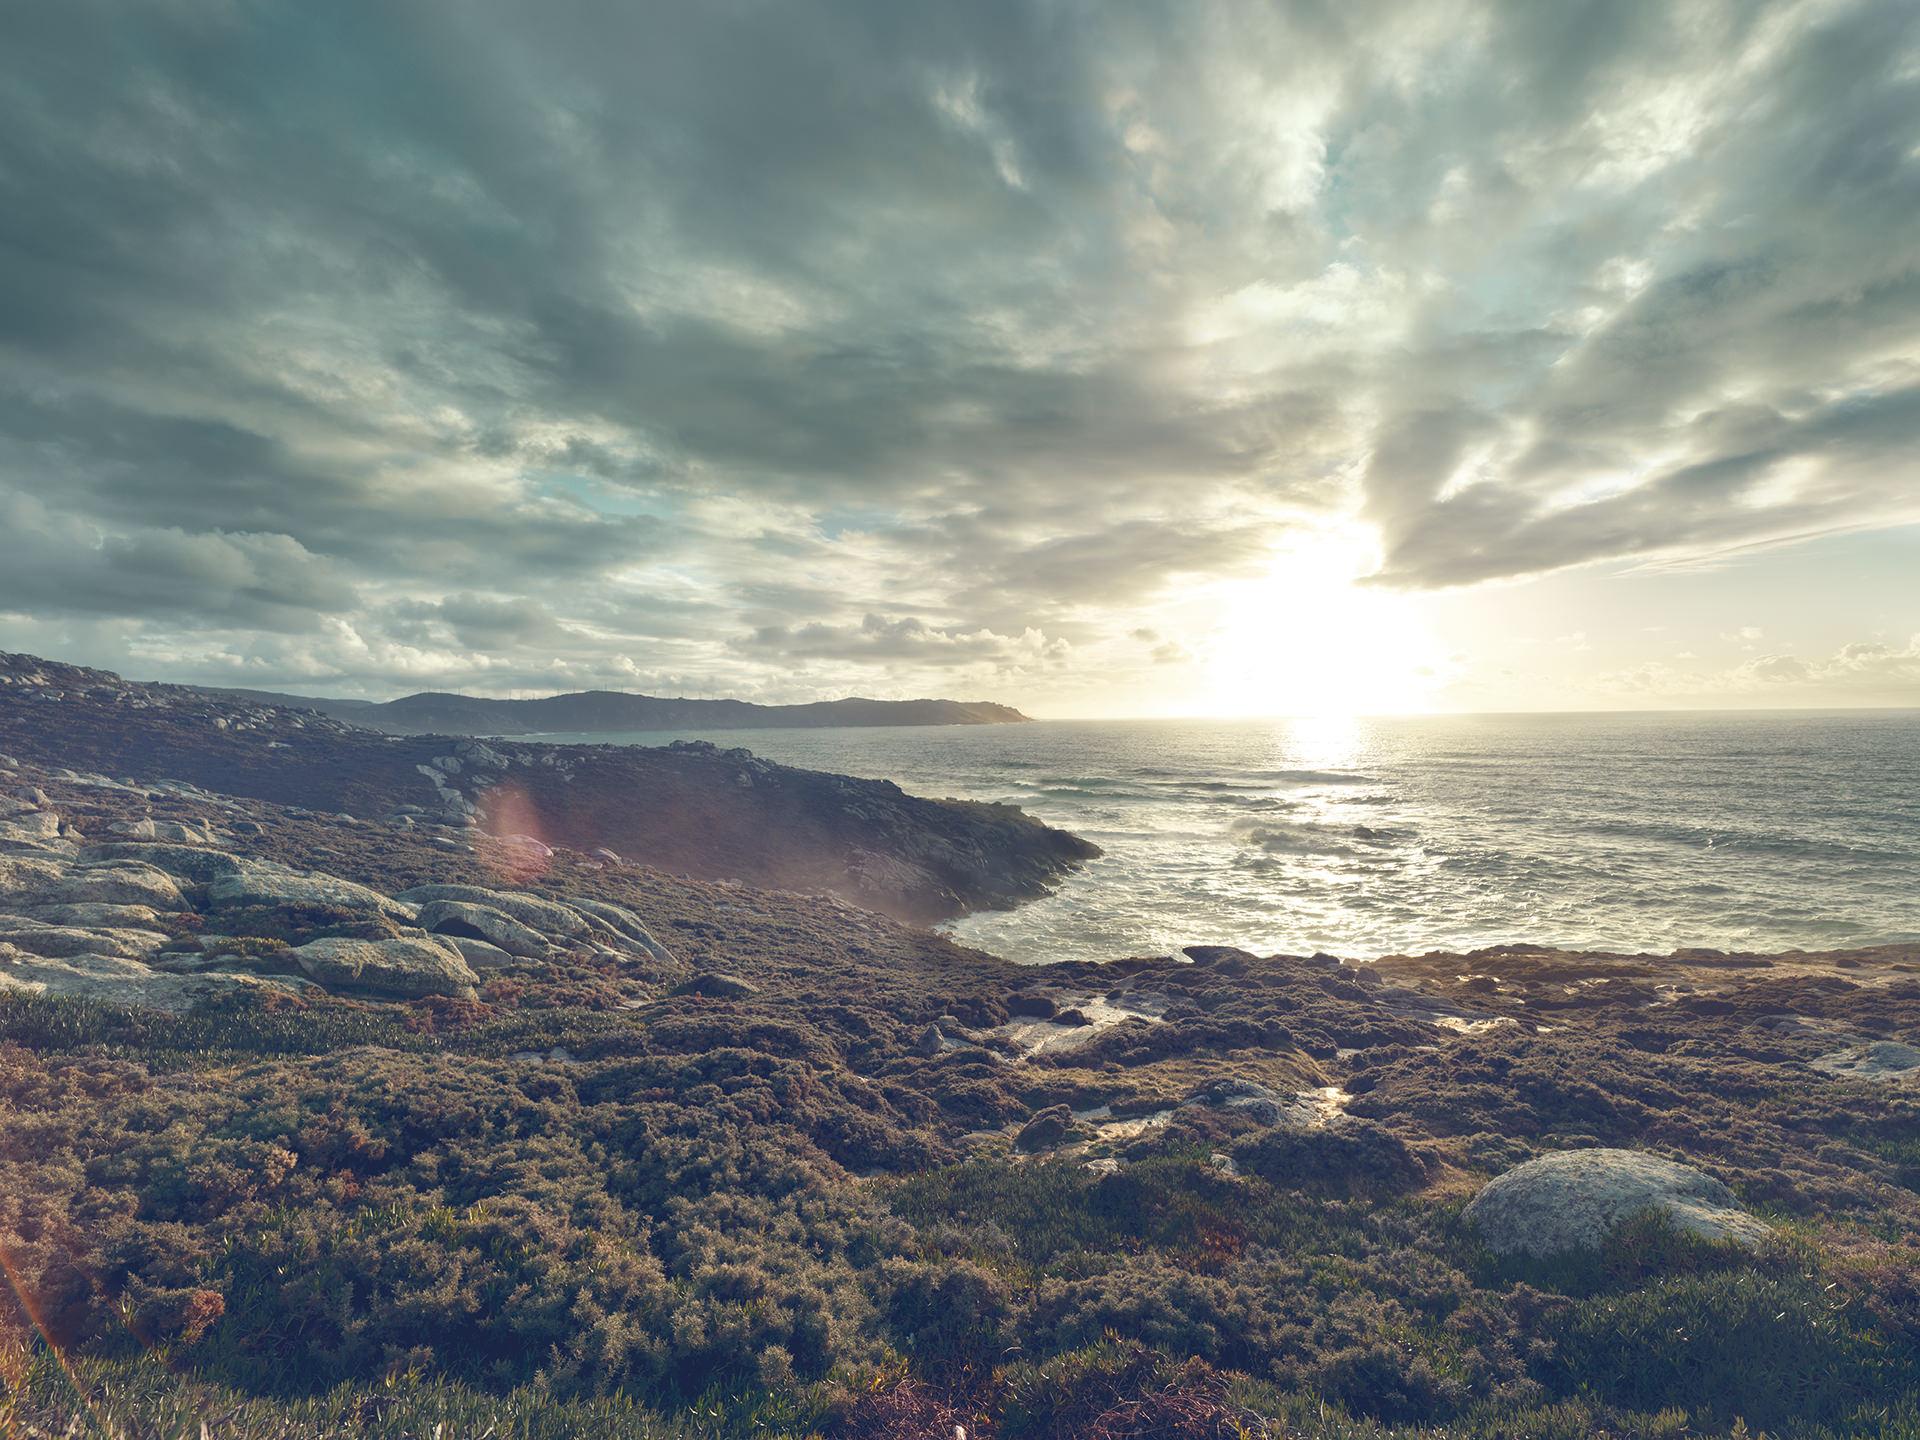 ©ankeluckmann1722, coast, galicia, green, landscape, rocks, spain, anke luckmann, www.ankeluckmann.com, sea